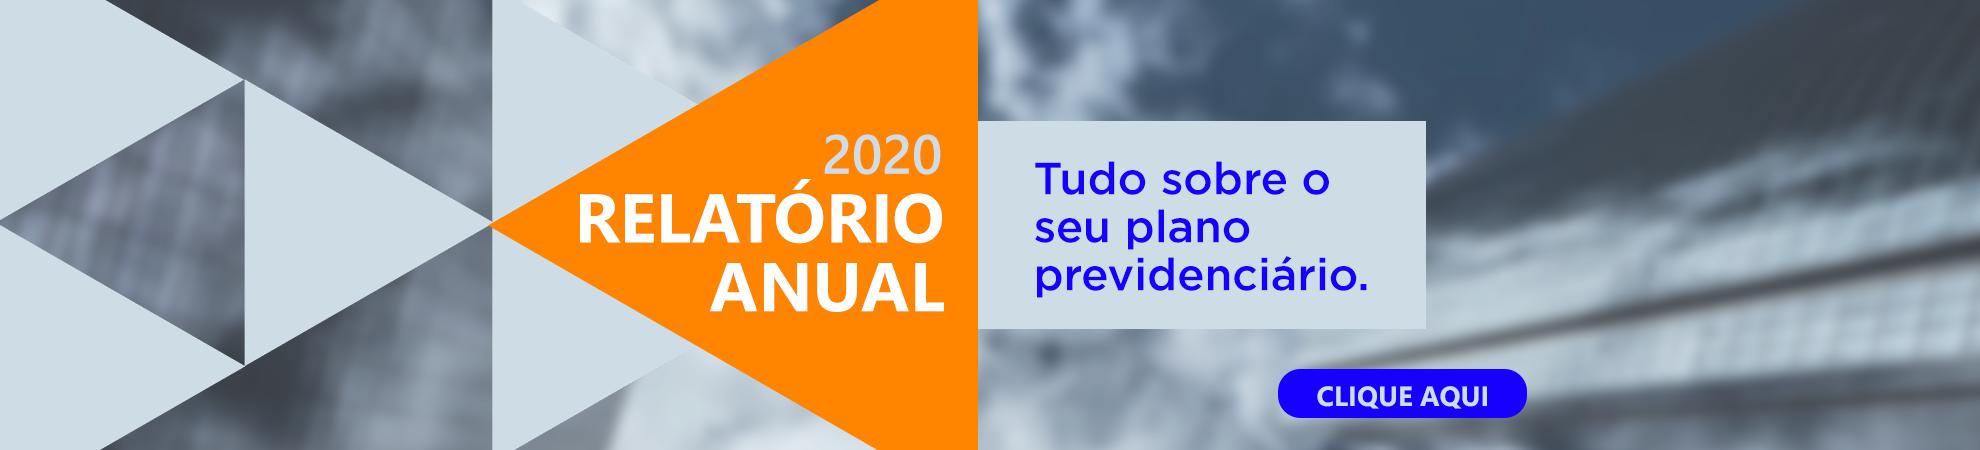 banner_relatorioanual_2020